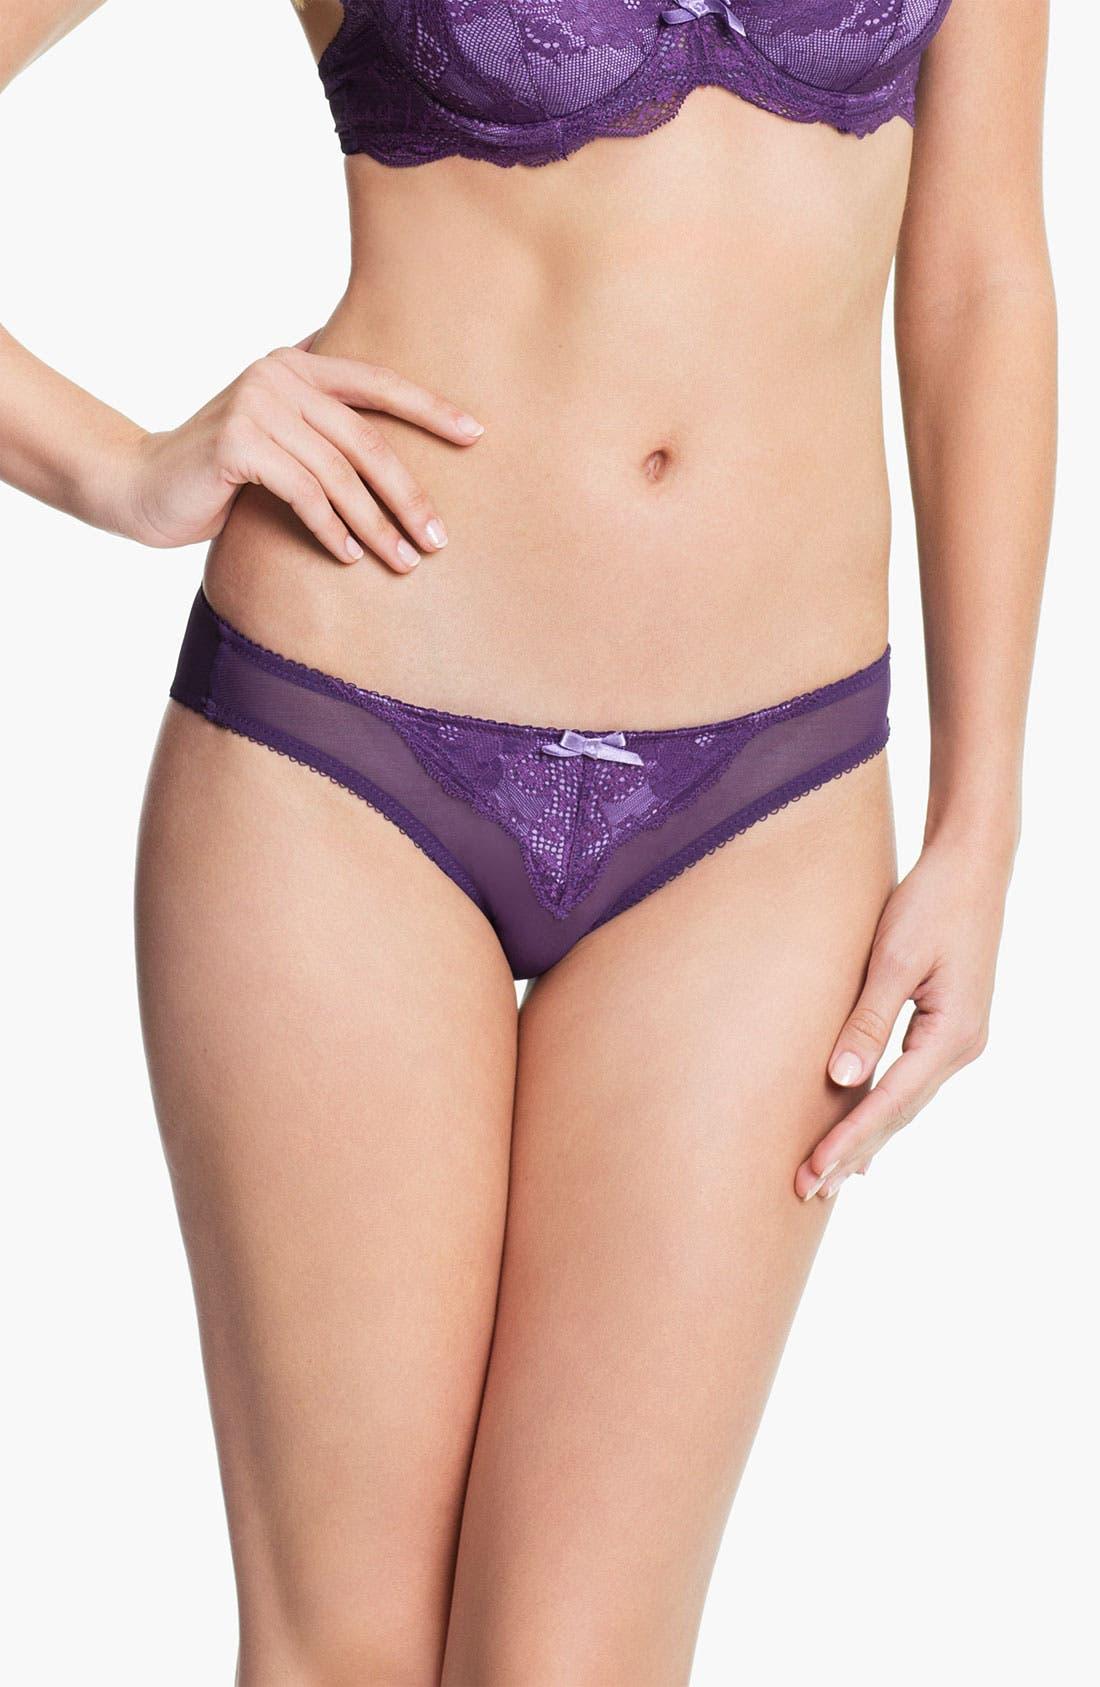 Alternate Image 1 Selected - Elle Macpherson Body 'Gentle Jade' Bikini